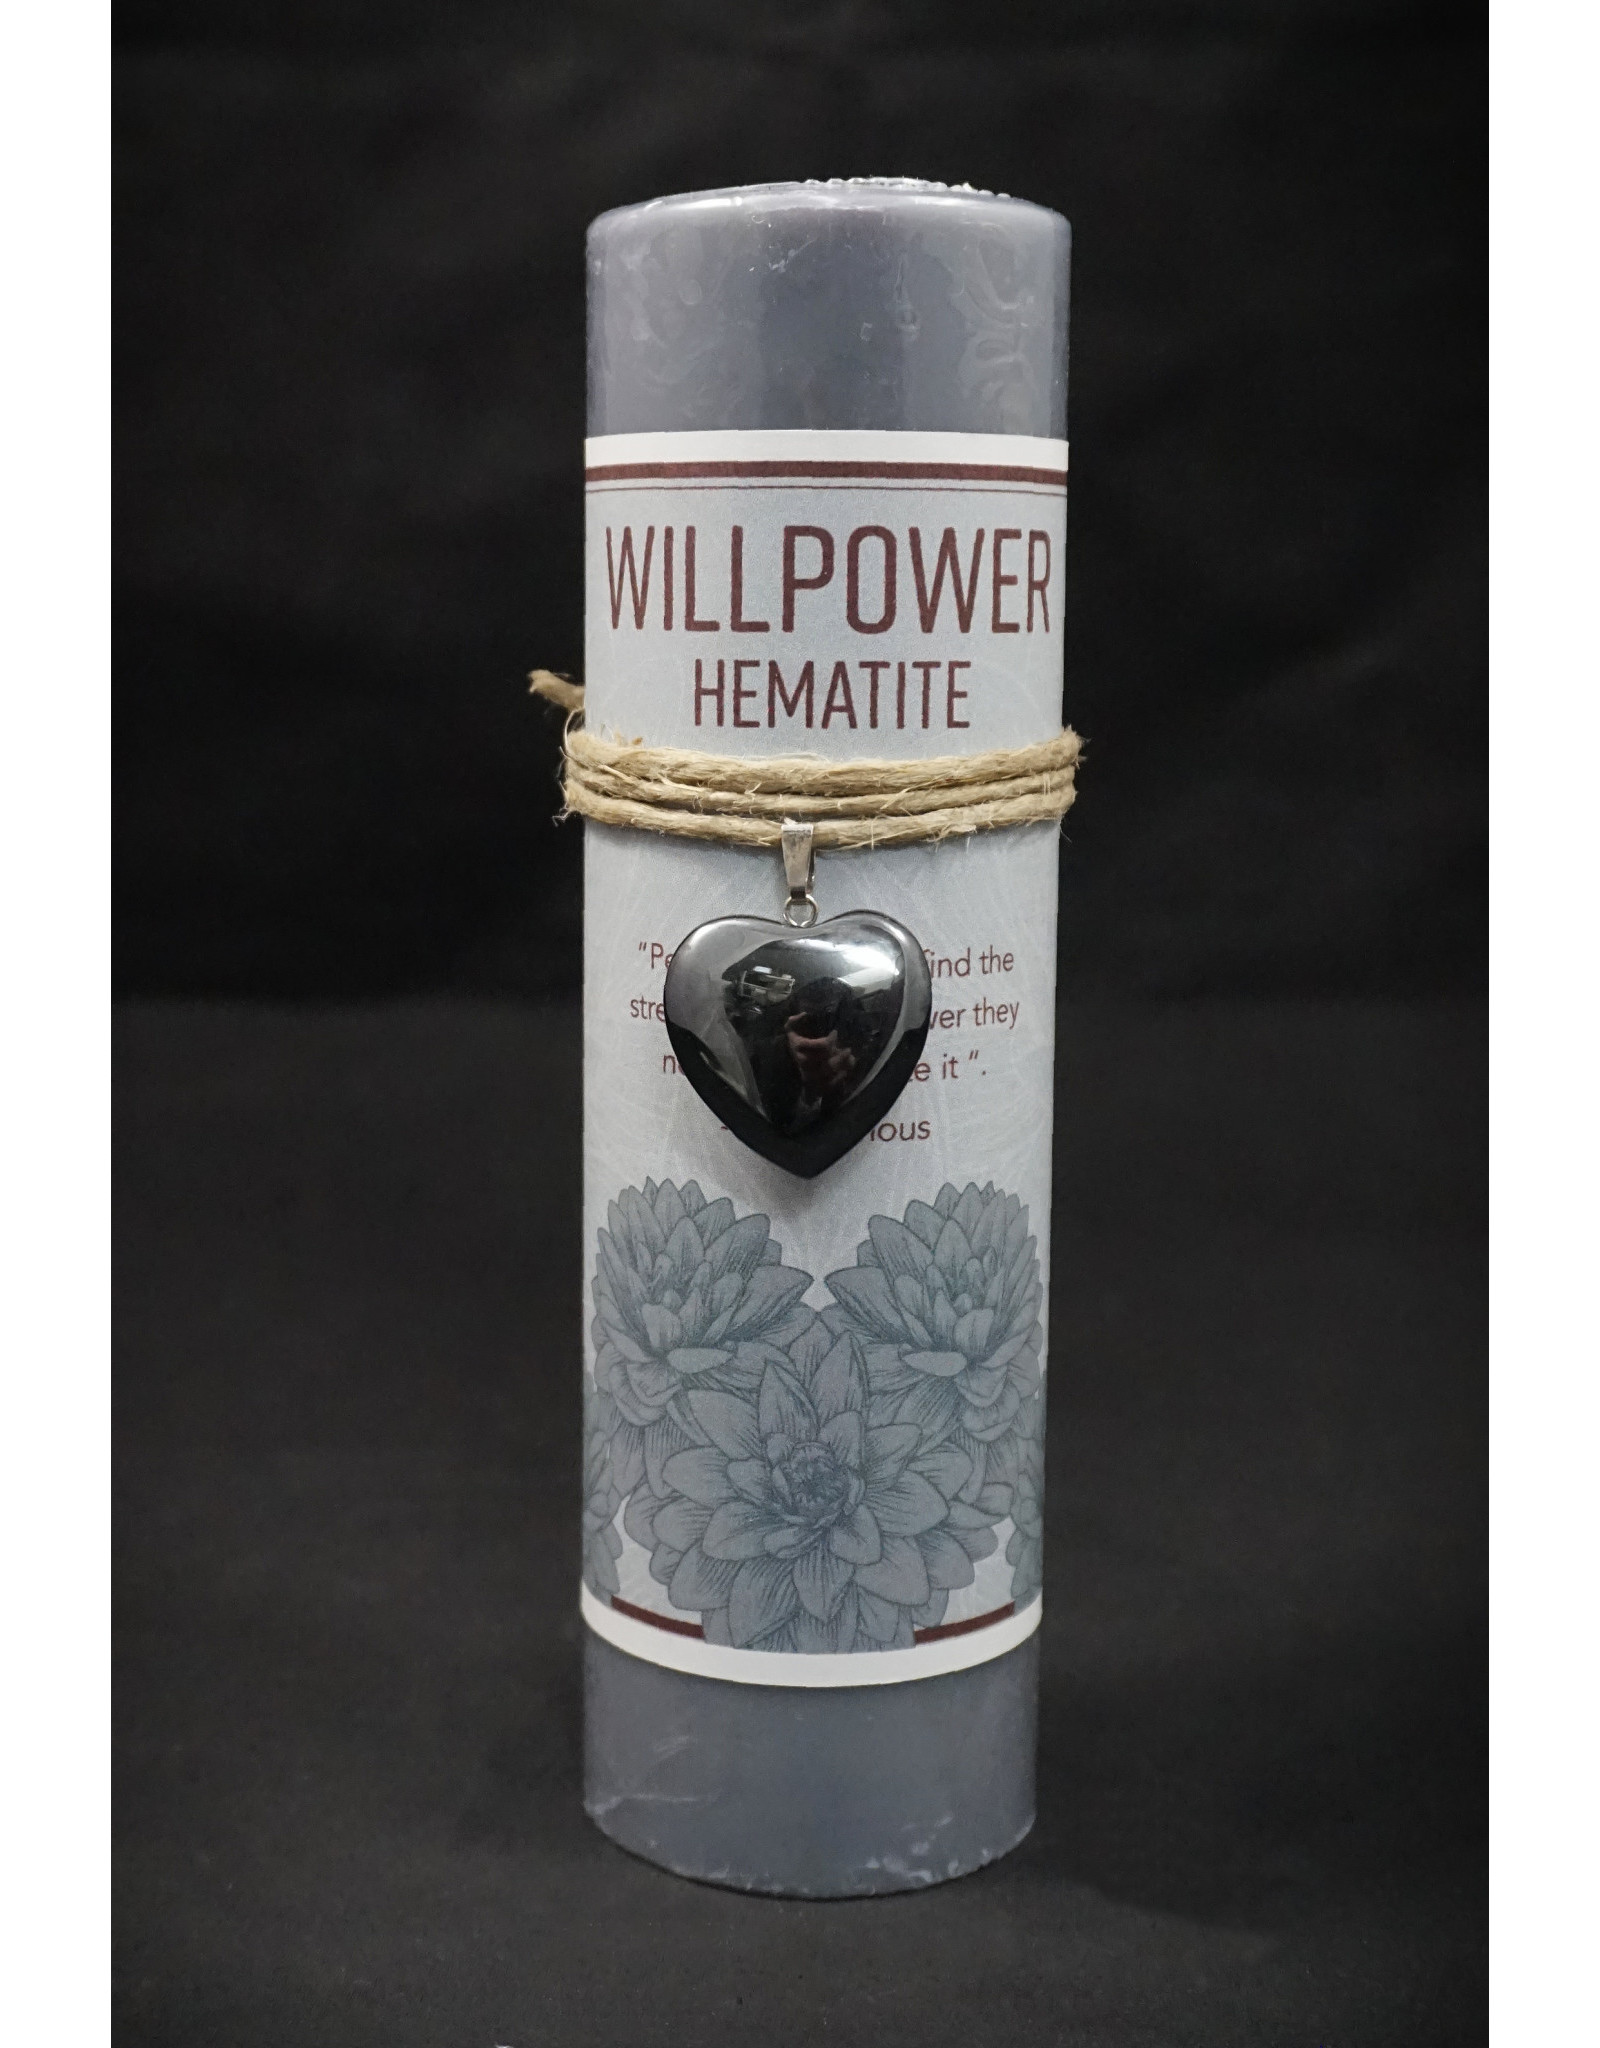 Heart Pendant Candle - Hematite Willpower